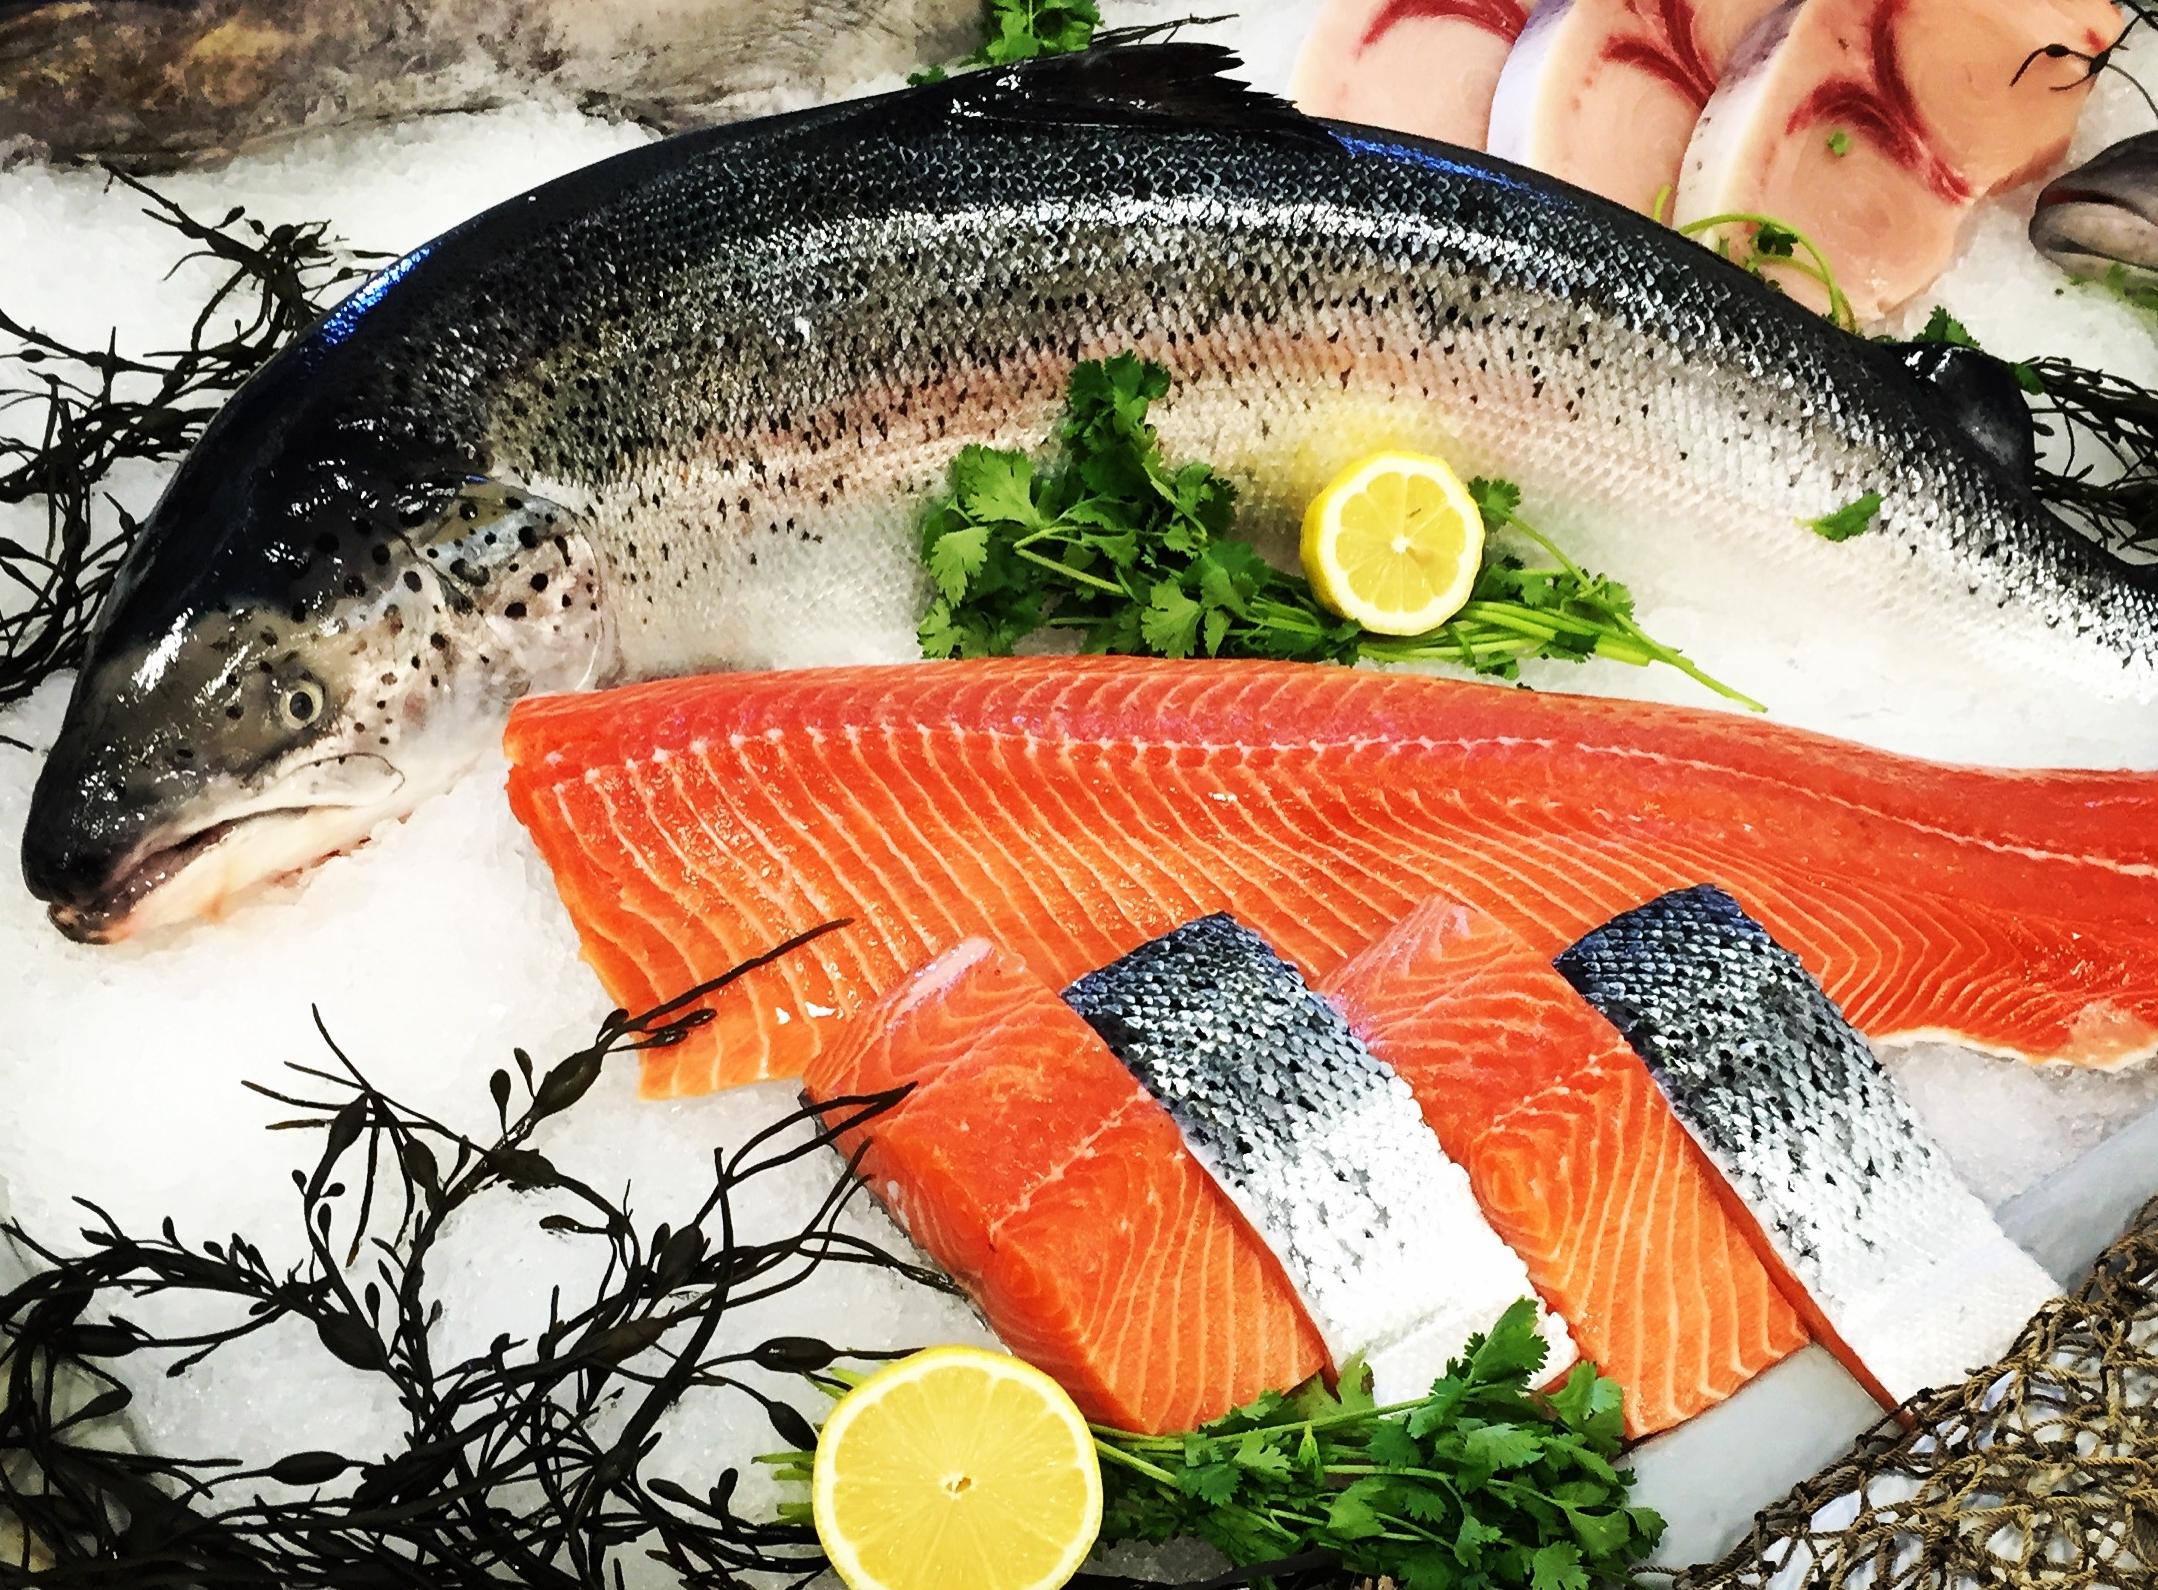 norway - canada - scotland - chile - faroe islands - atlantic salmon